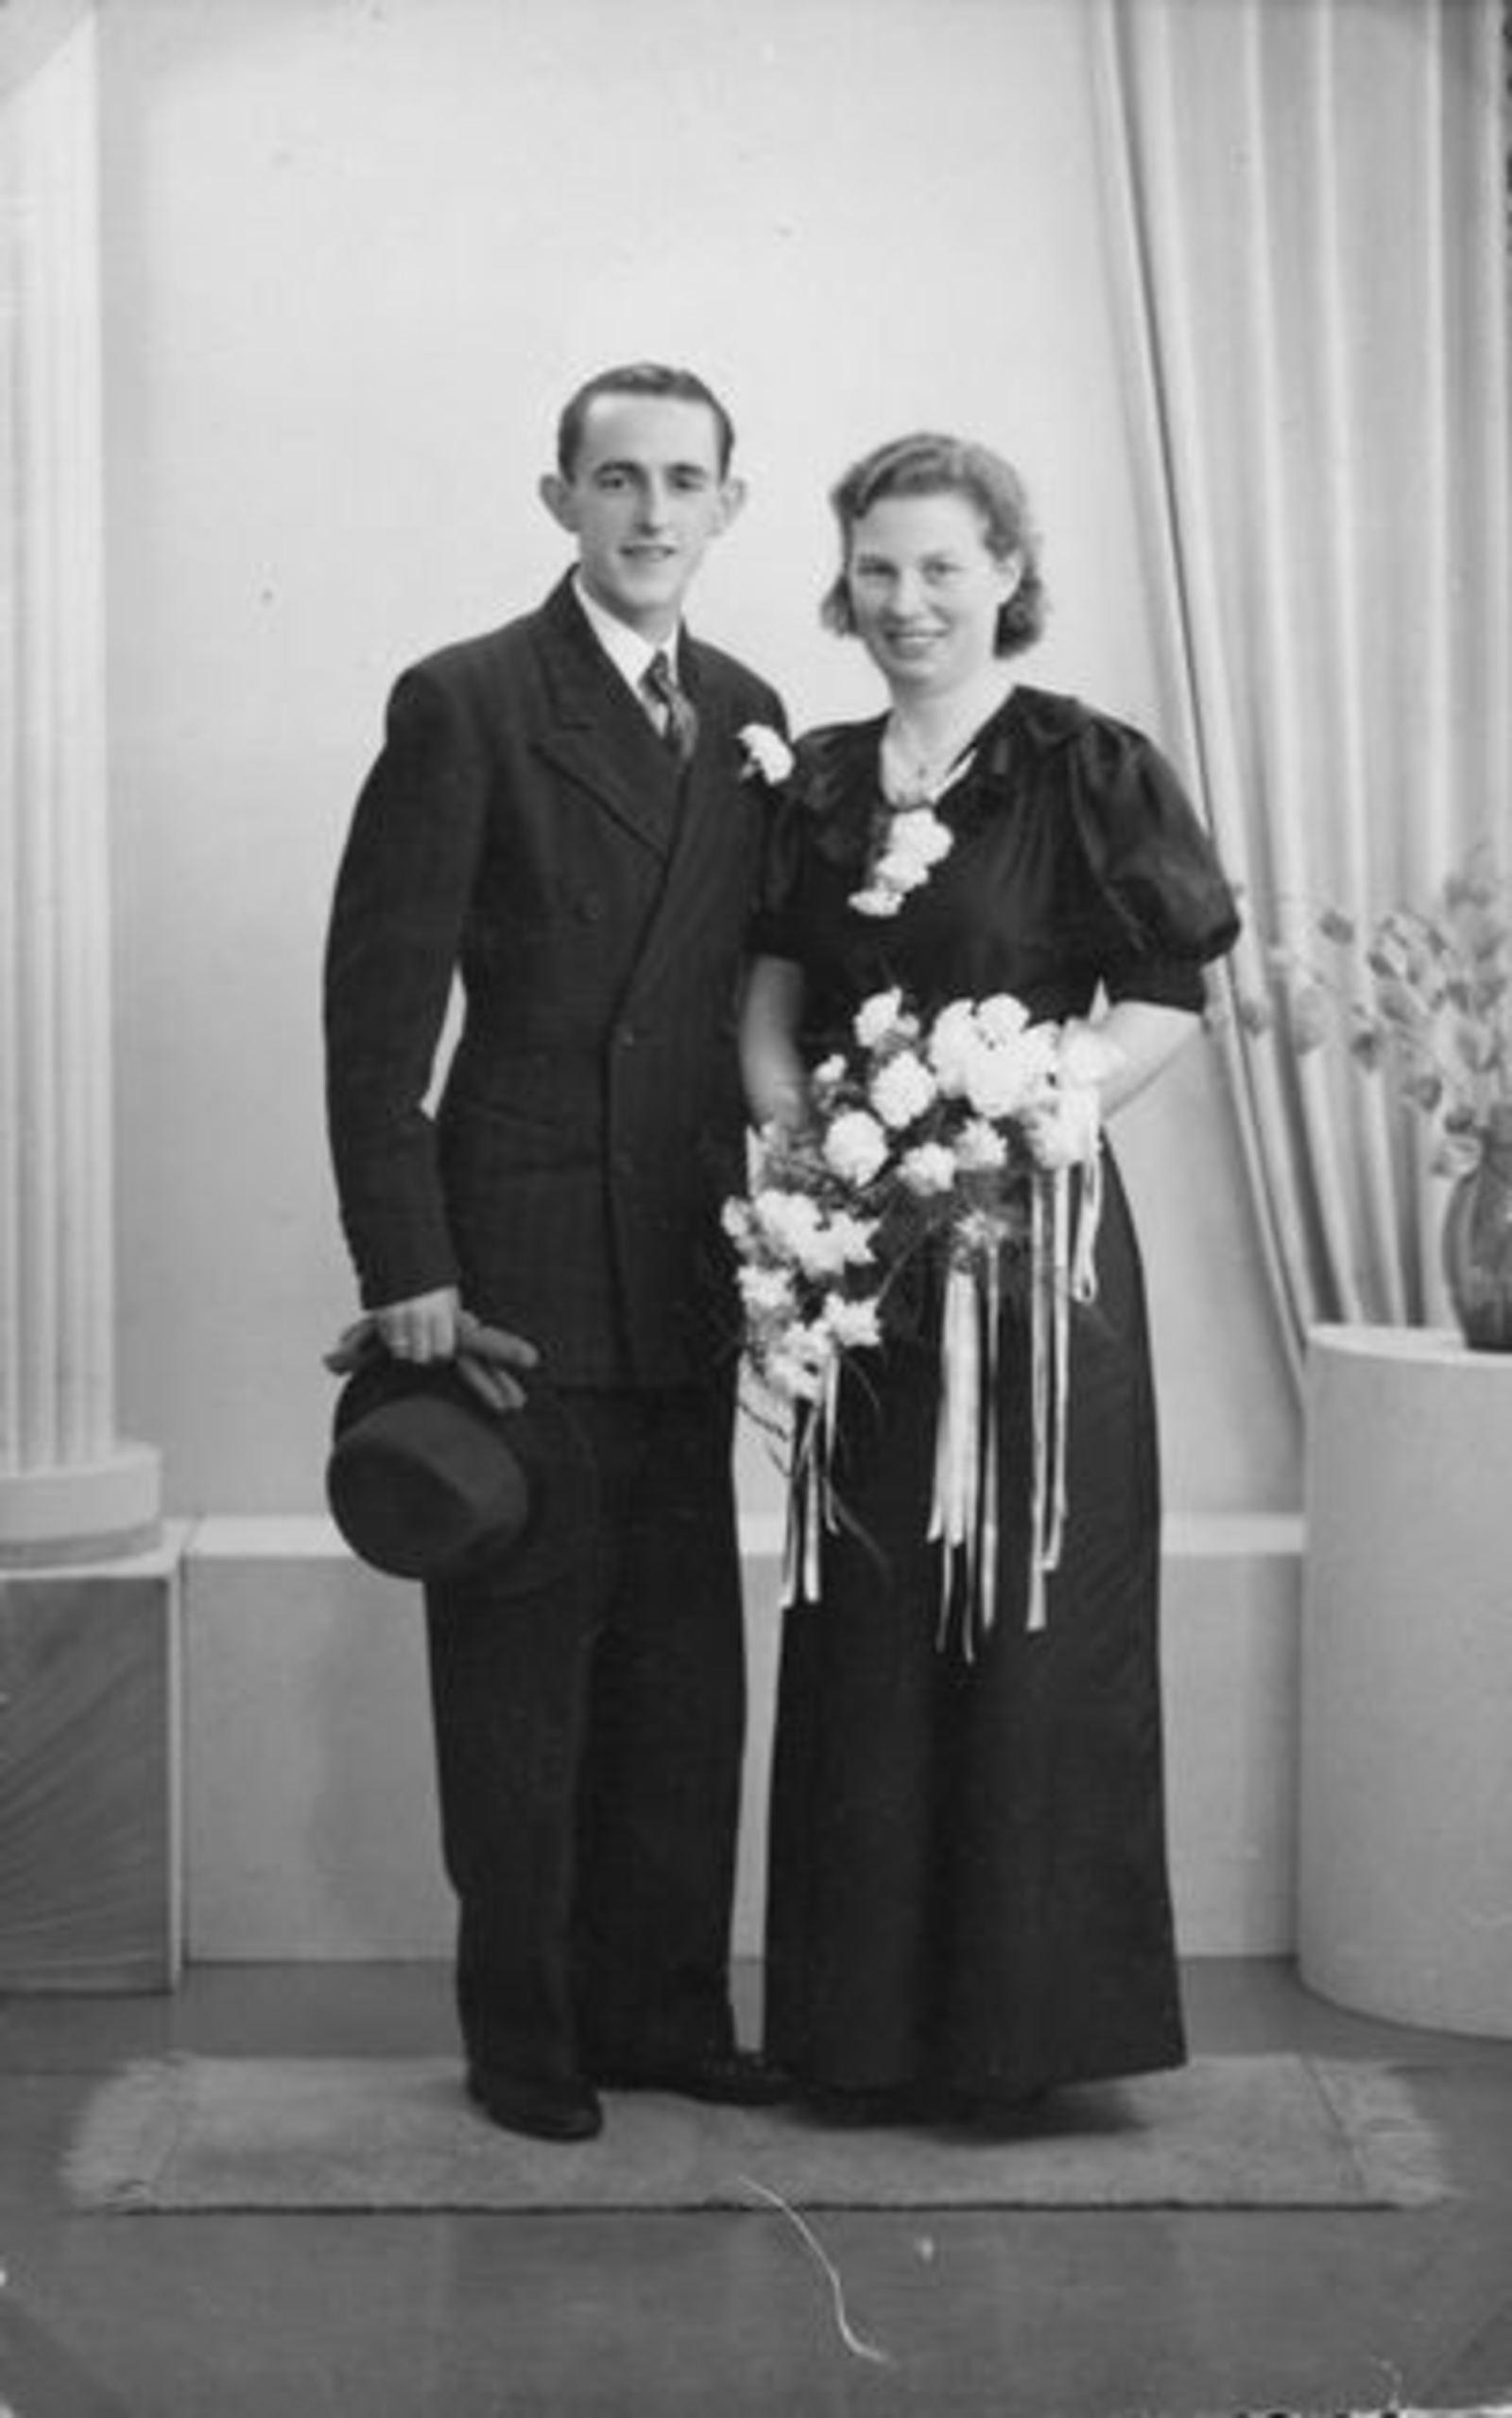 Broere Jan E C 1923 19__ trouwt met Annie vd Hoorn